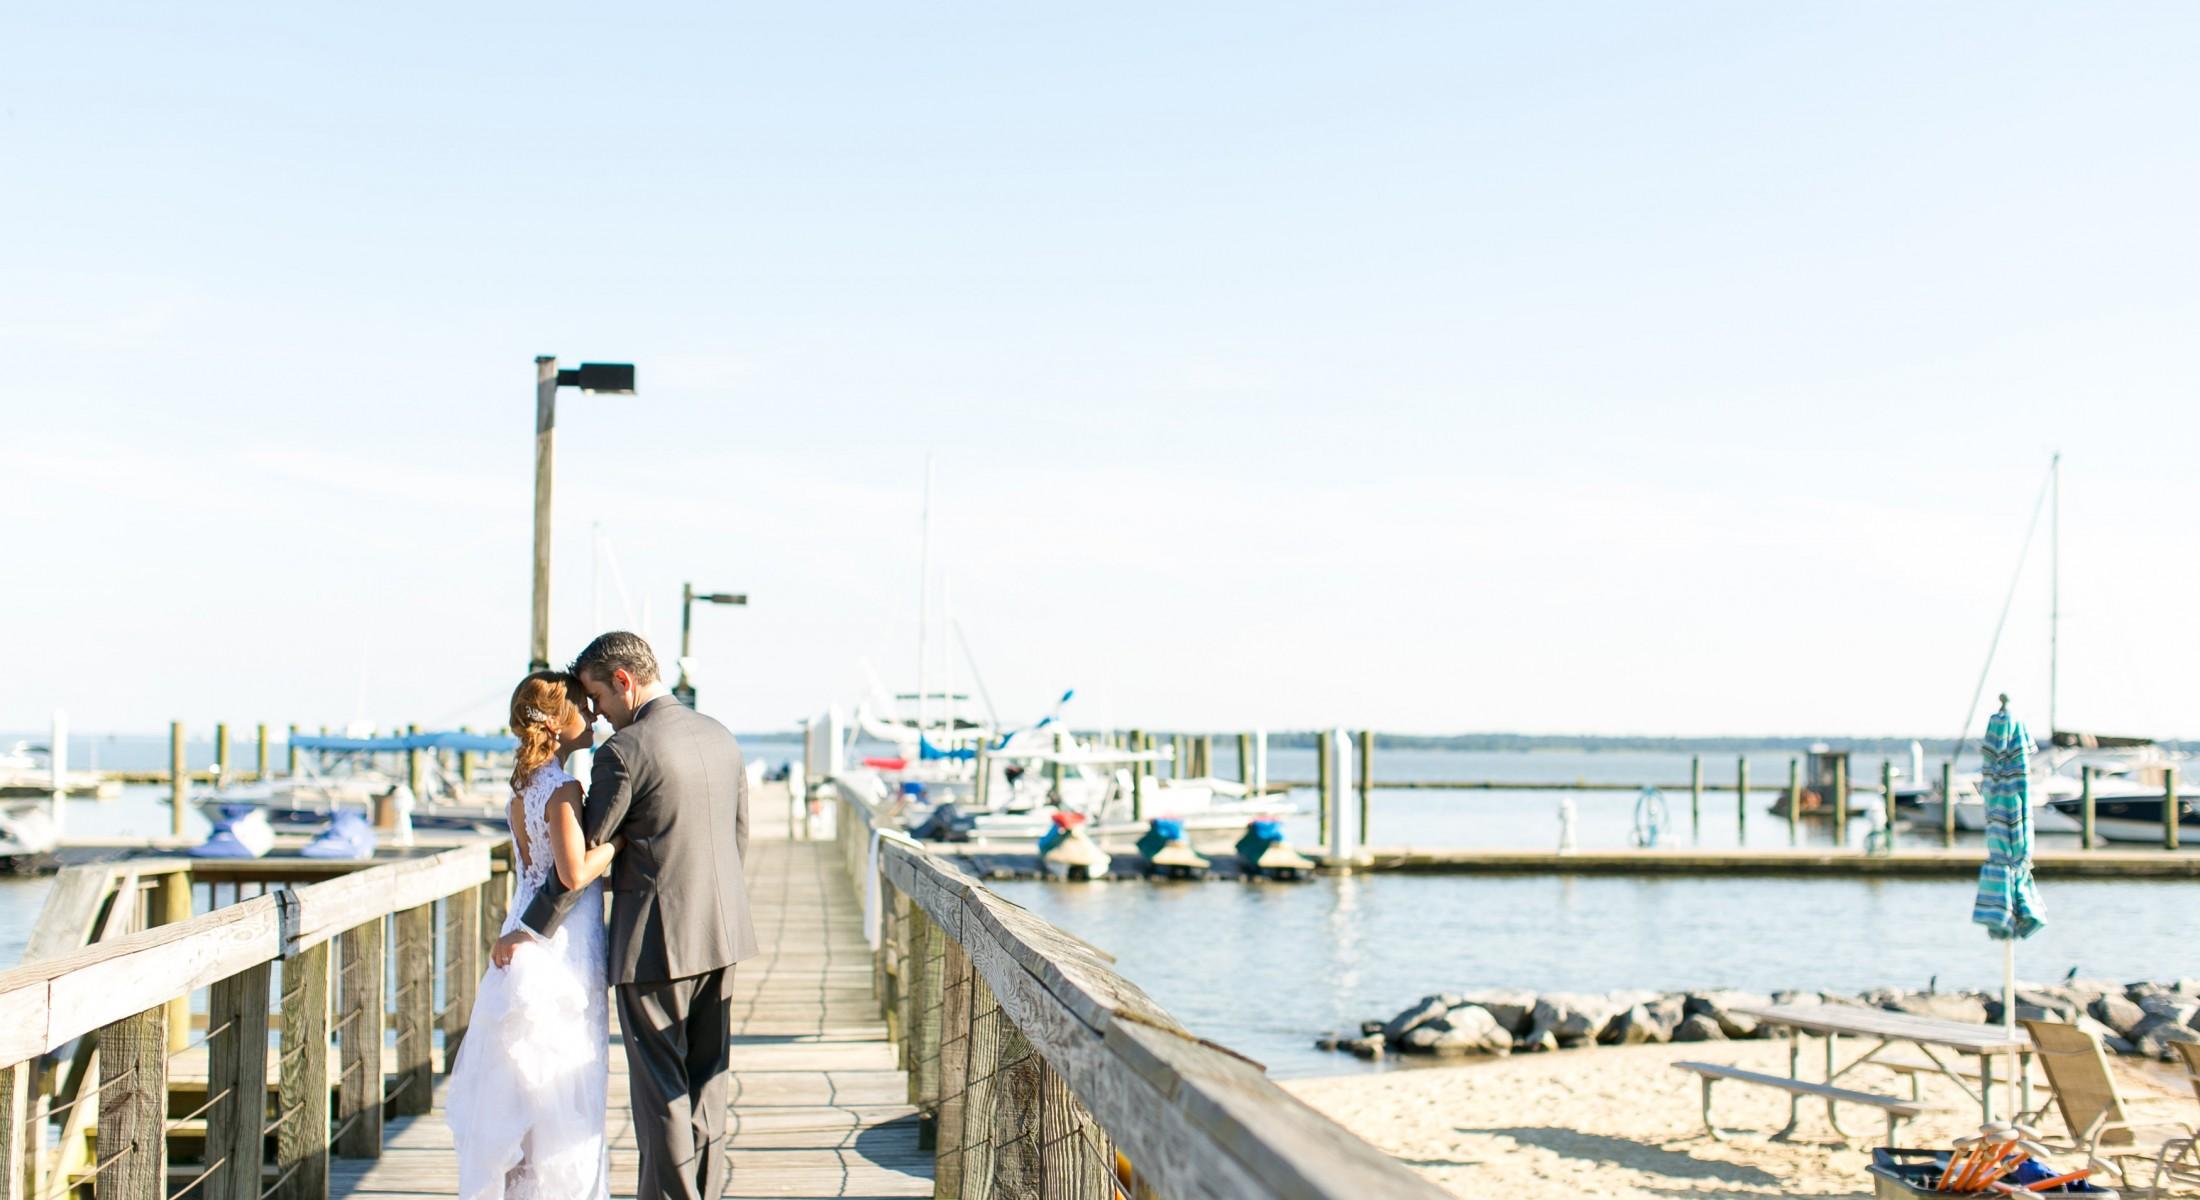 View More: http://jenandashley.pass.us/fetznerwedding; wedding shot at marina